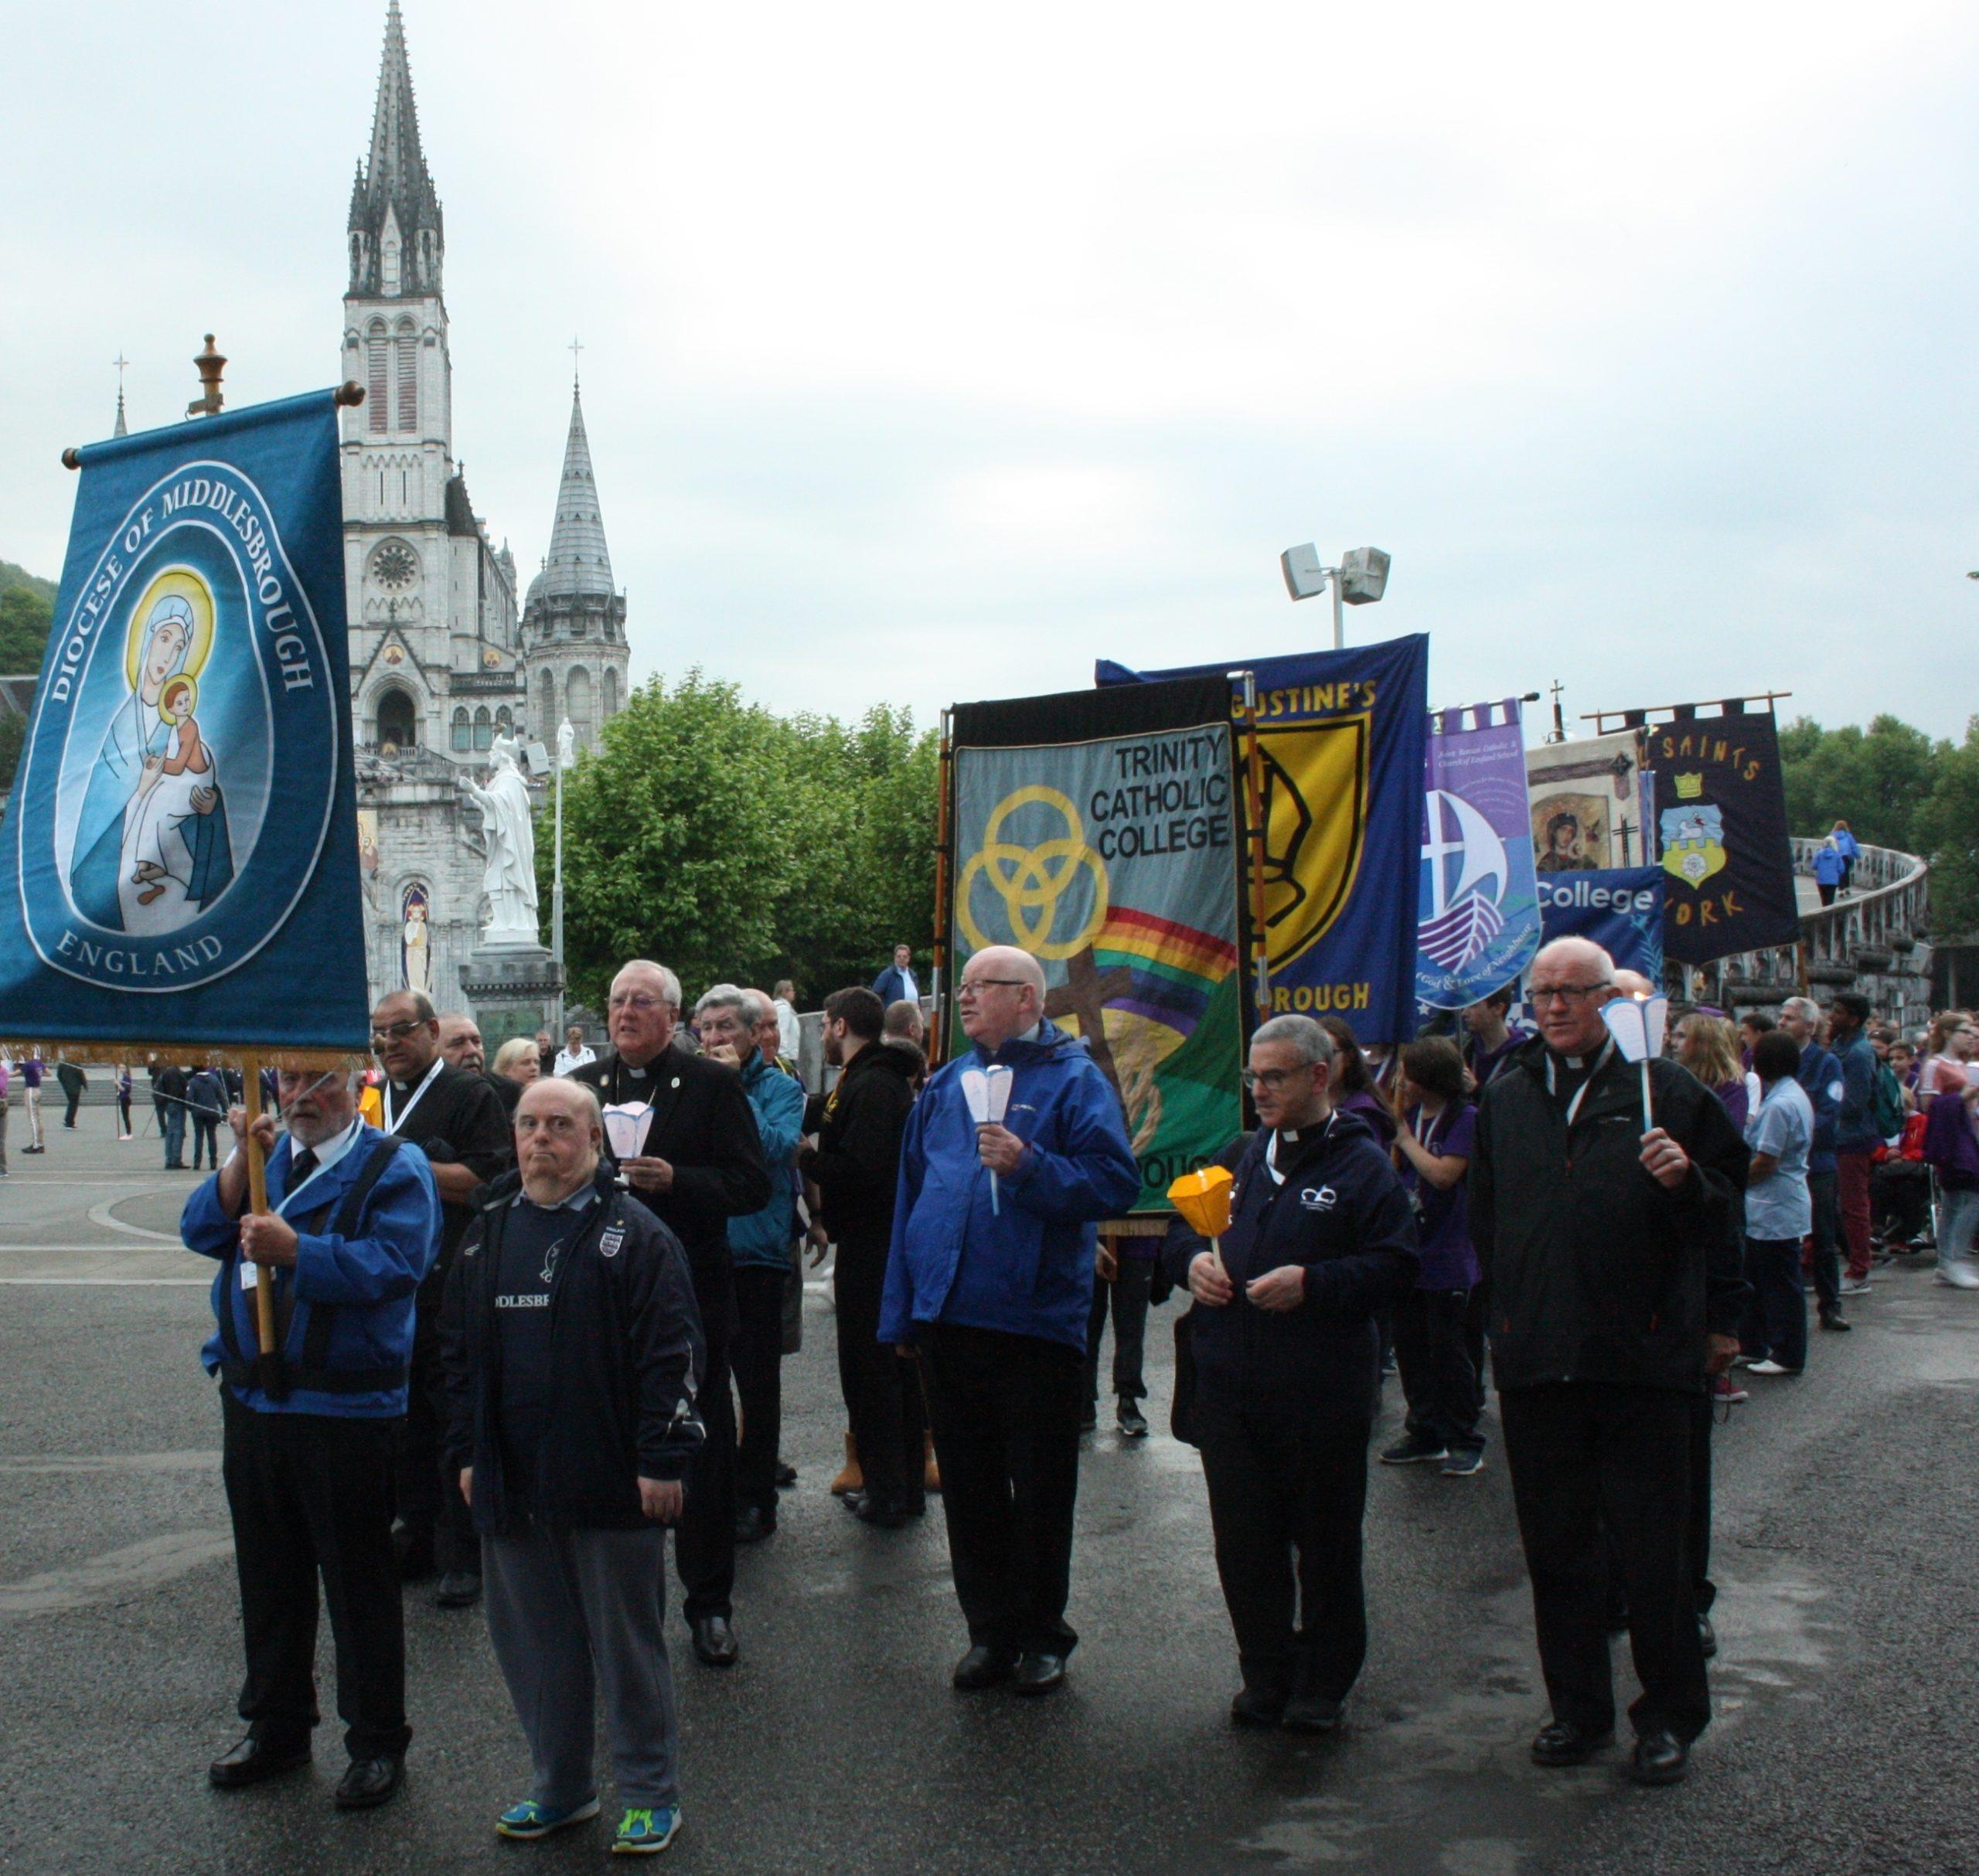 Torchlight procession – Photo by Joe Harrison